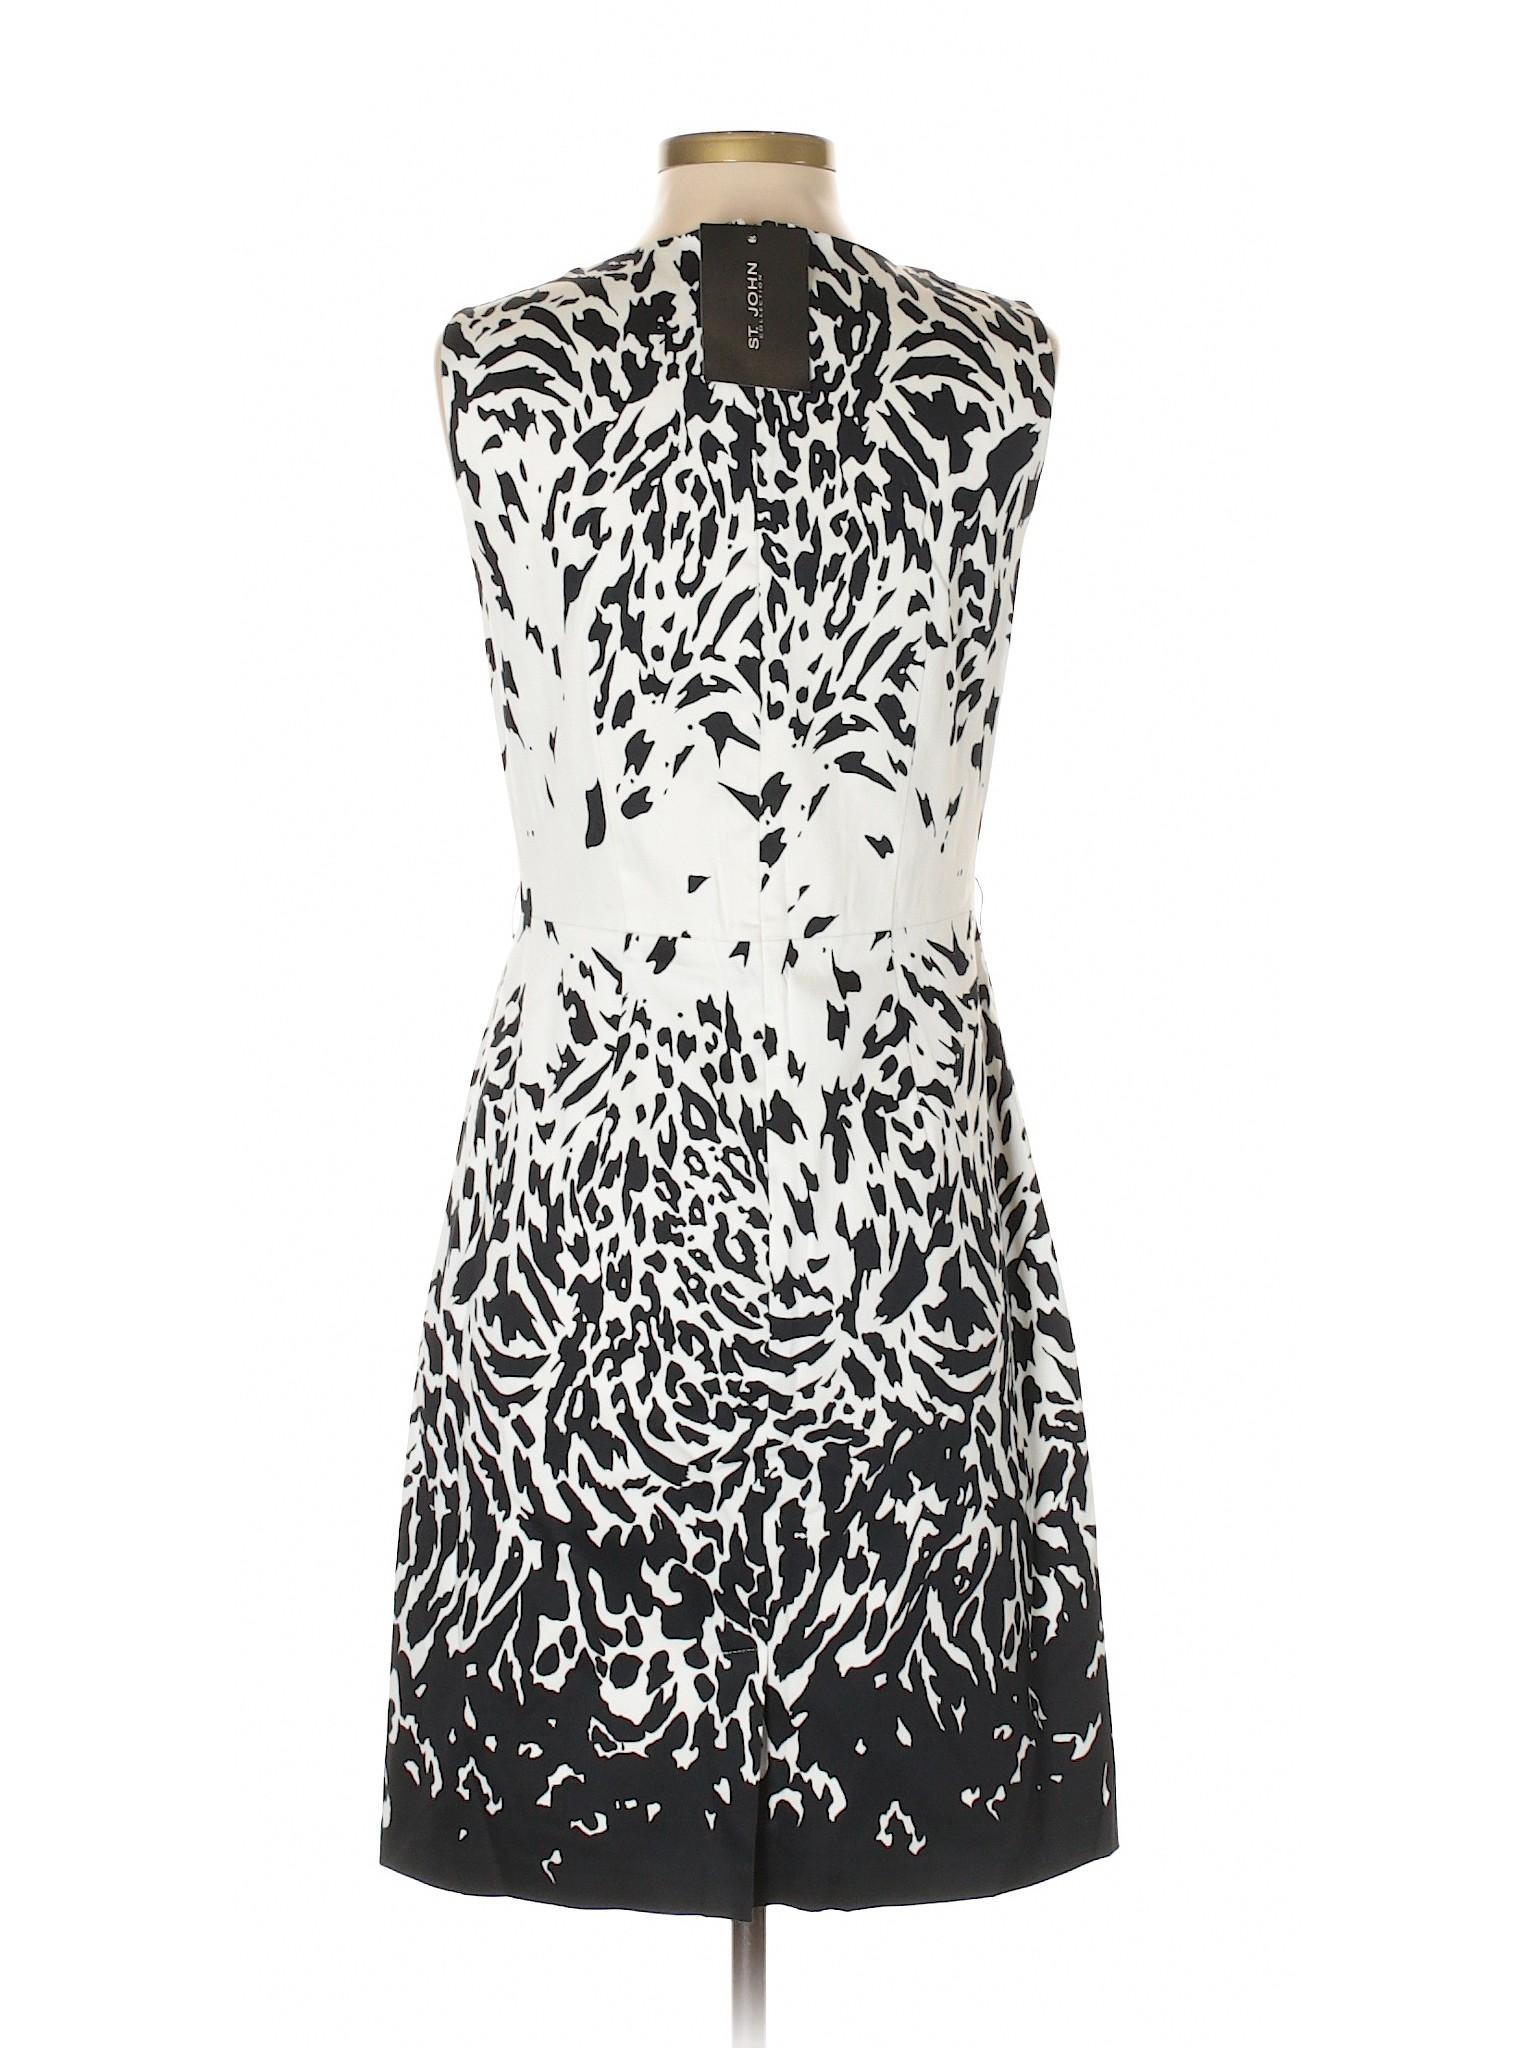 Boutique John Dress St winter Casual Collection BBwaRqx